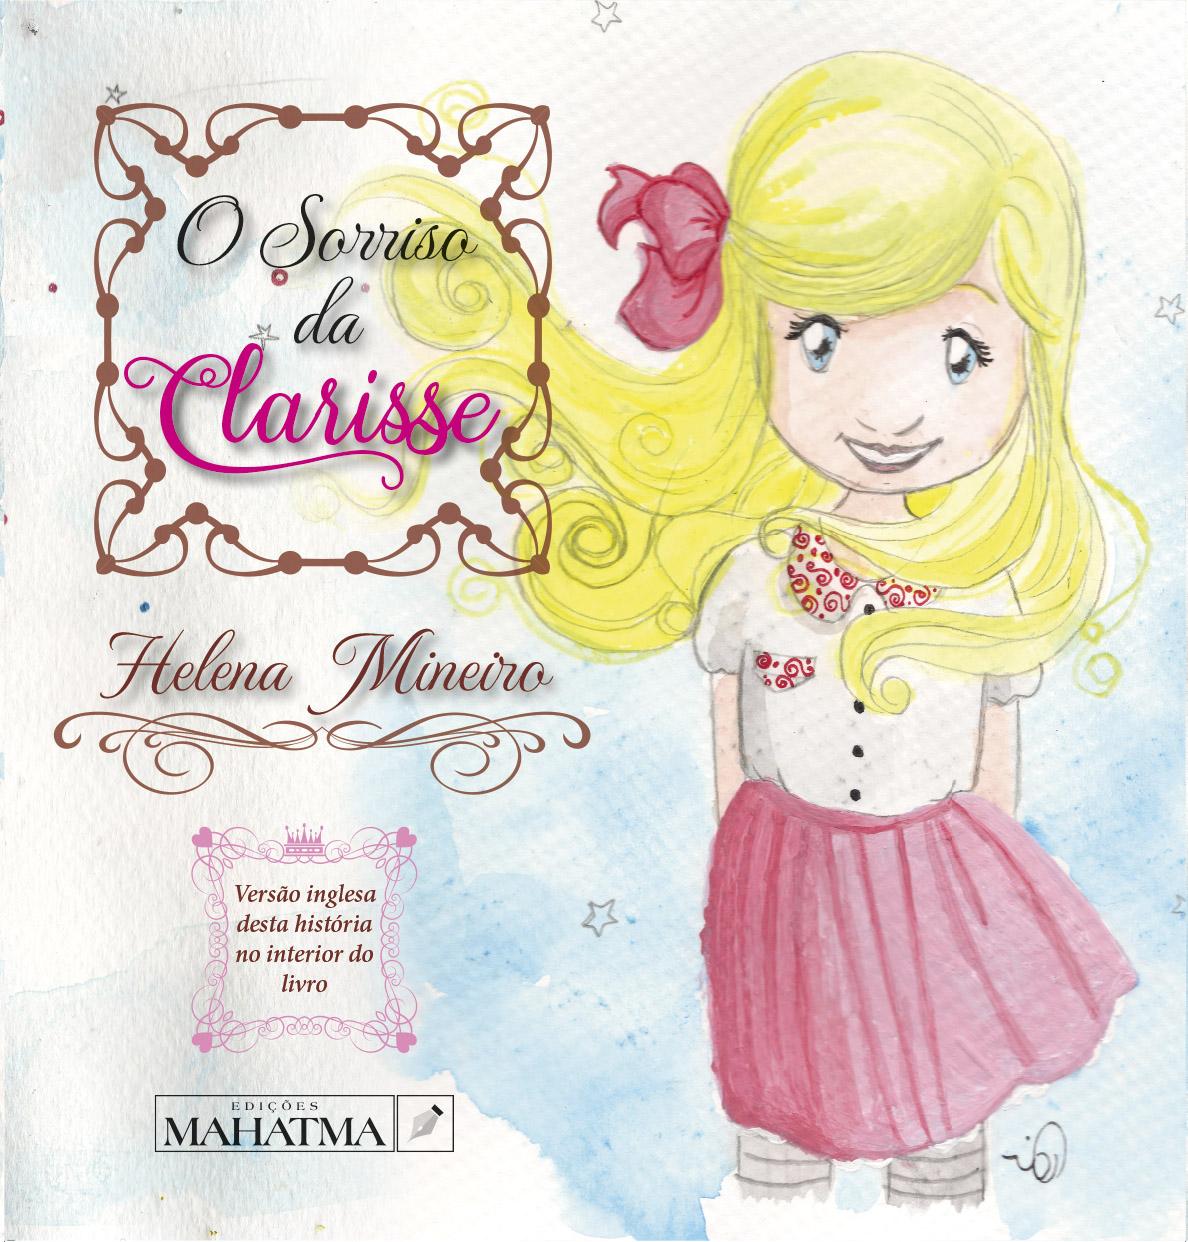 O Sorriso da Clarisse